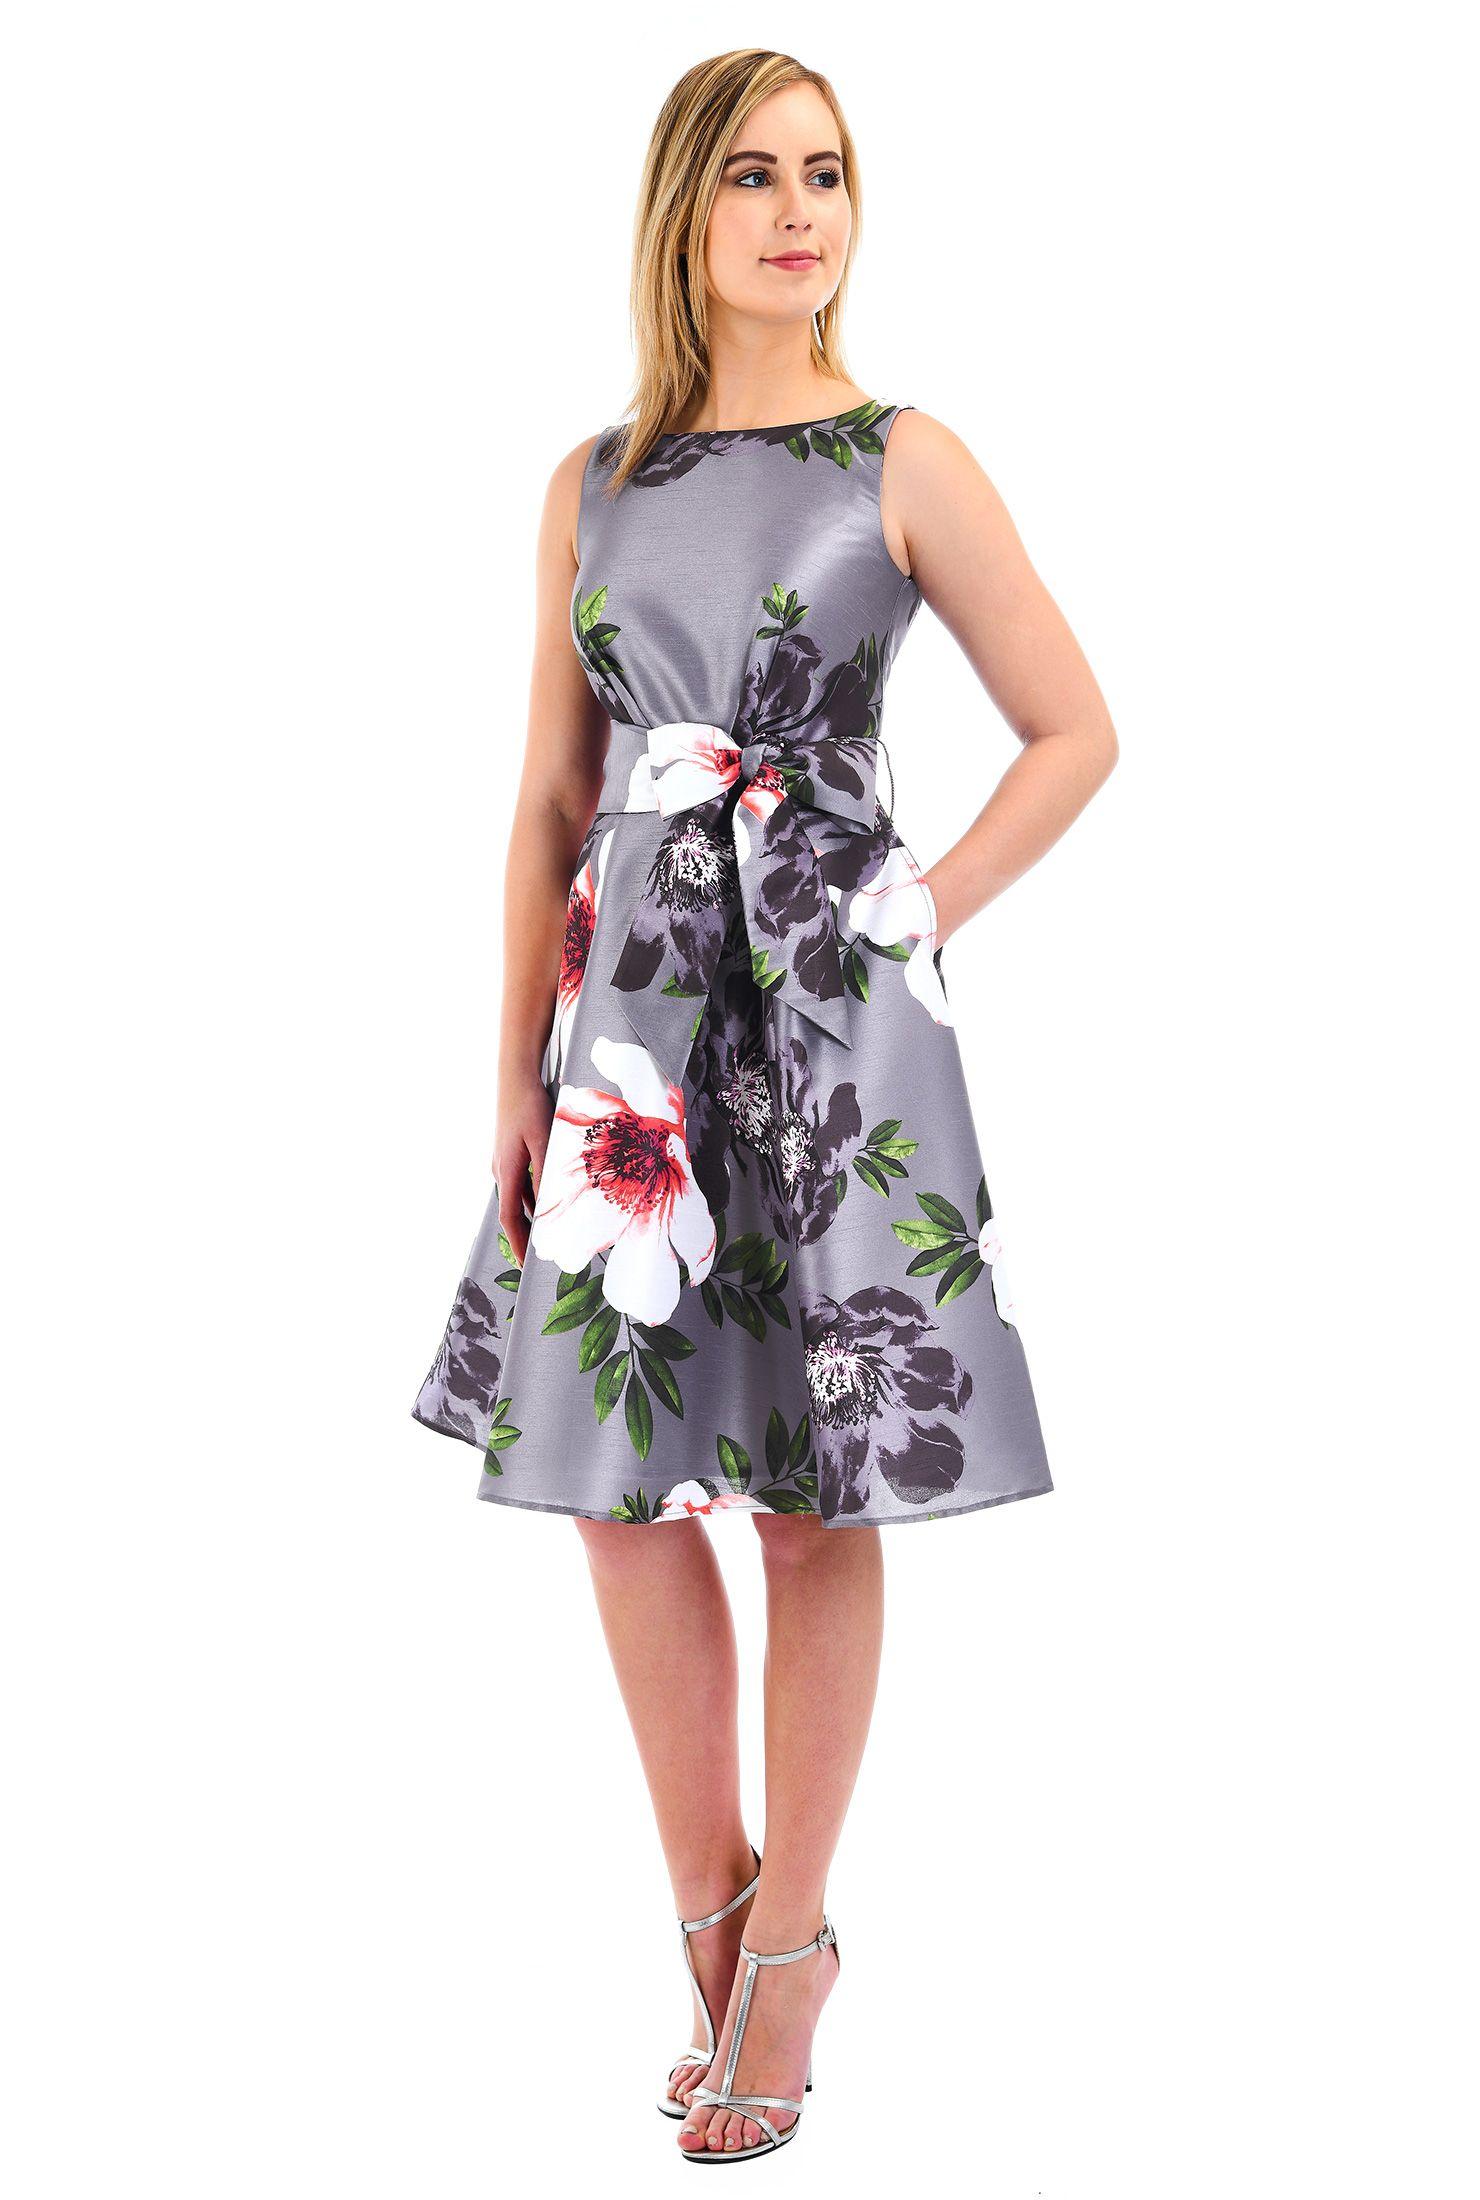 Back zip dresses below knee length dresses boat neck dresses dry